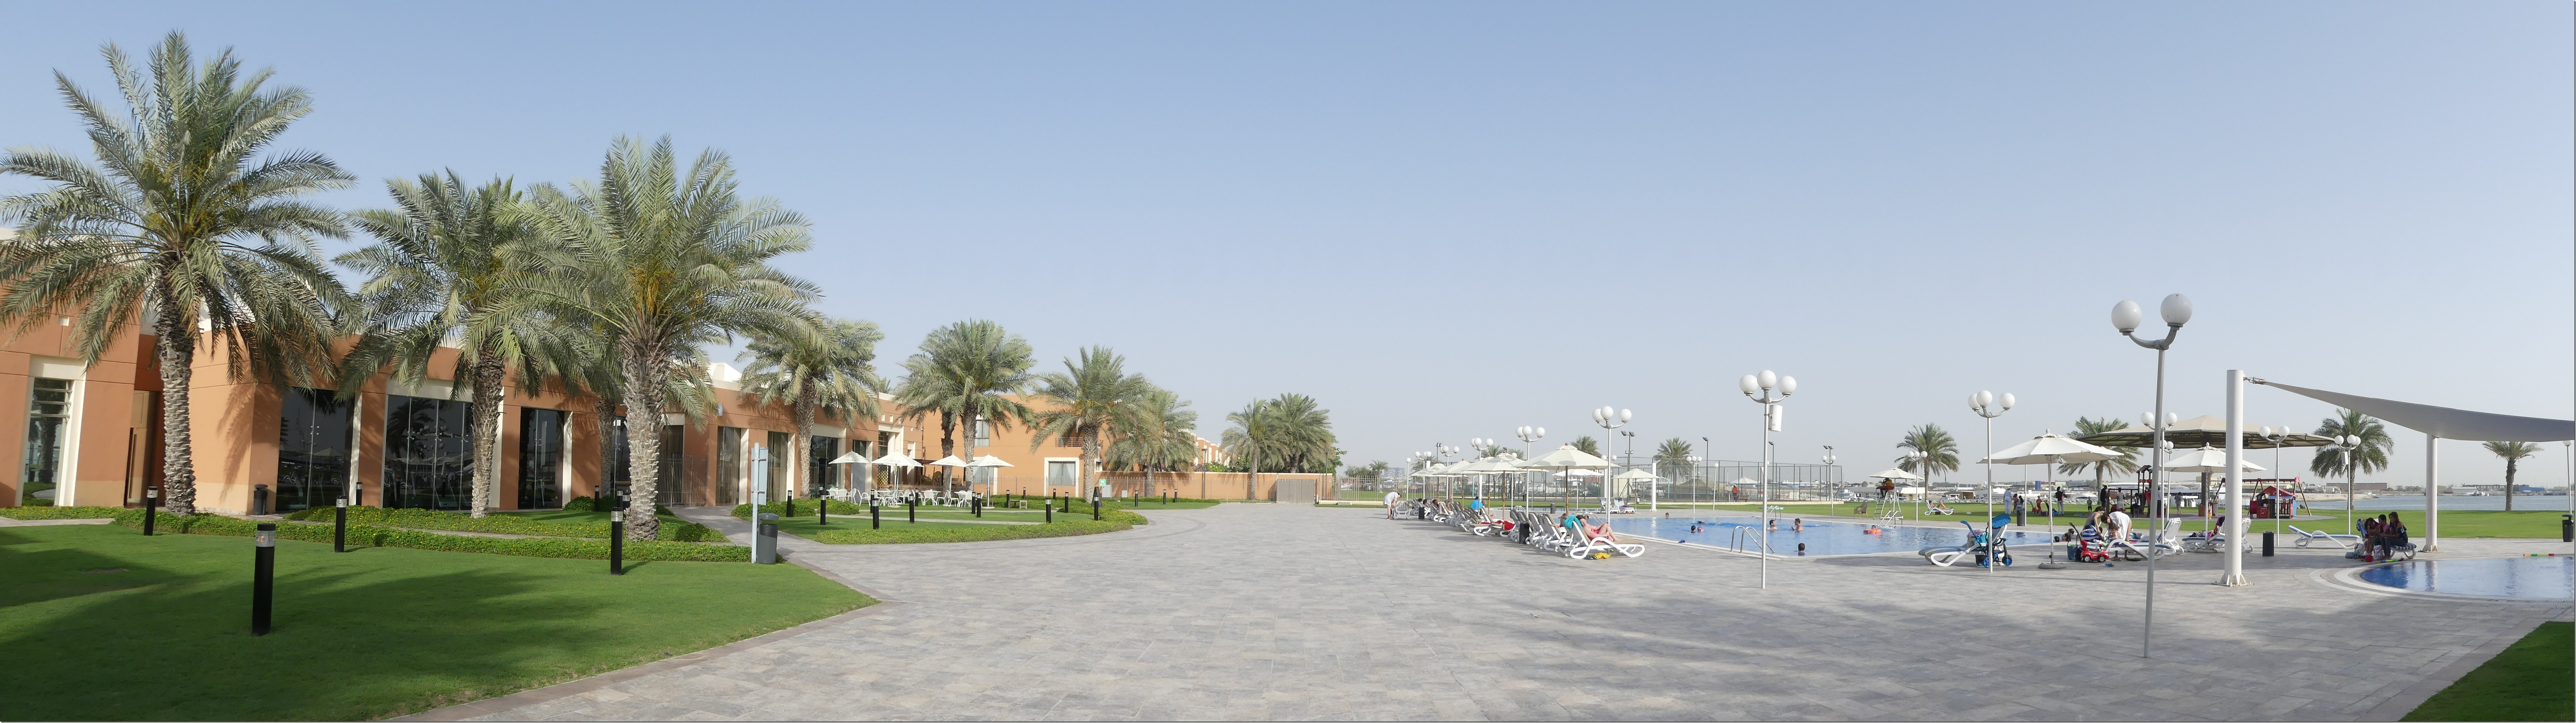 Abu Dhabi - chez les expats (2)